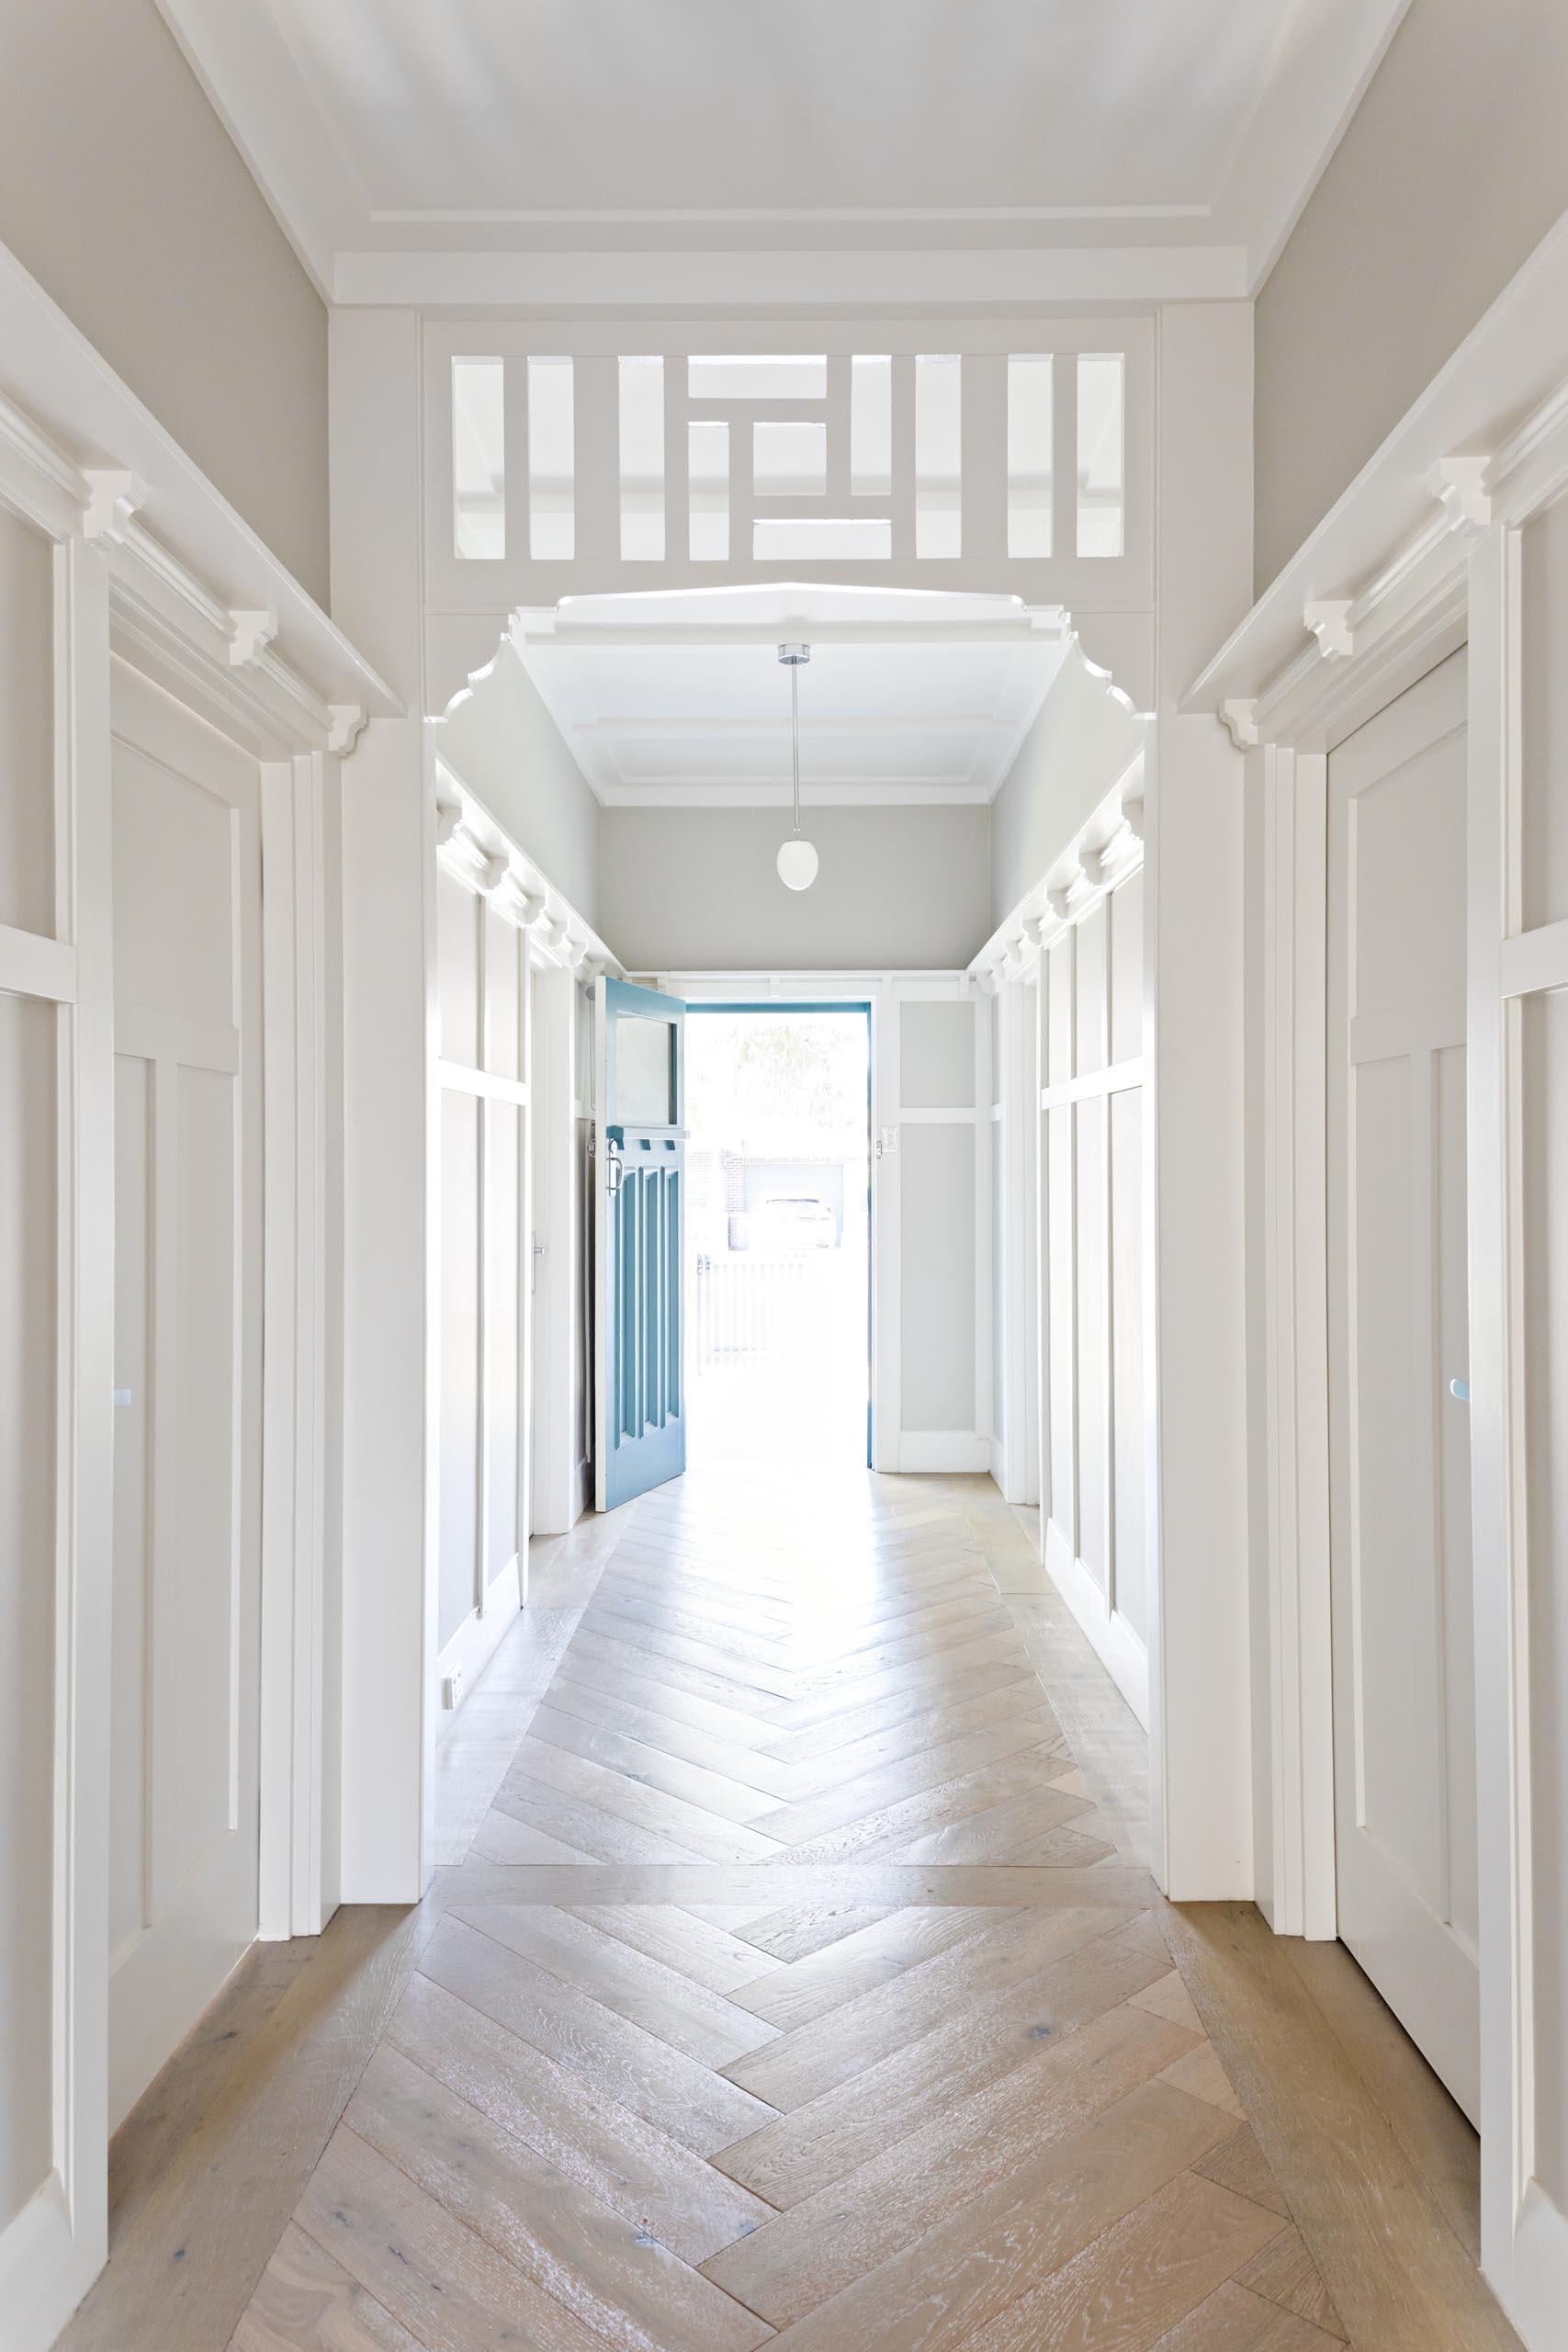 A renovated hallway with herringbone wood flooring.